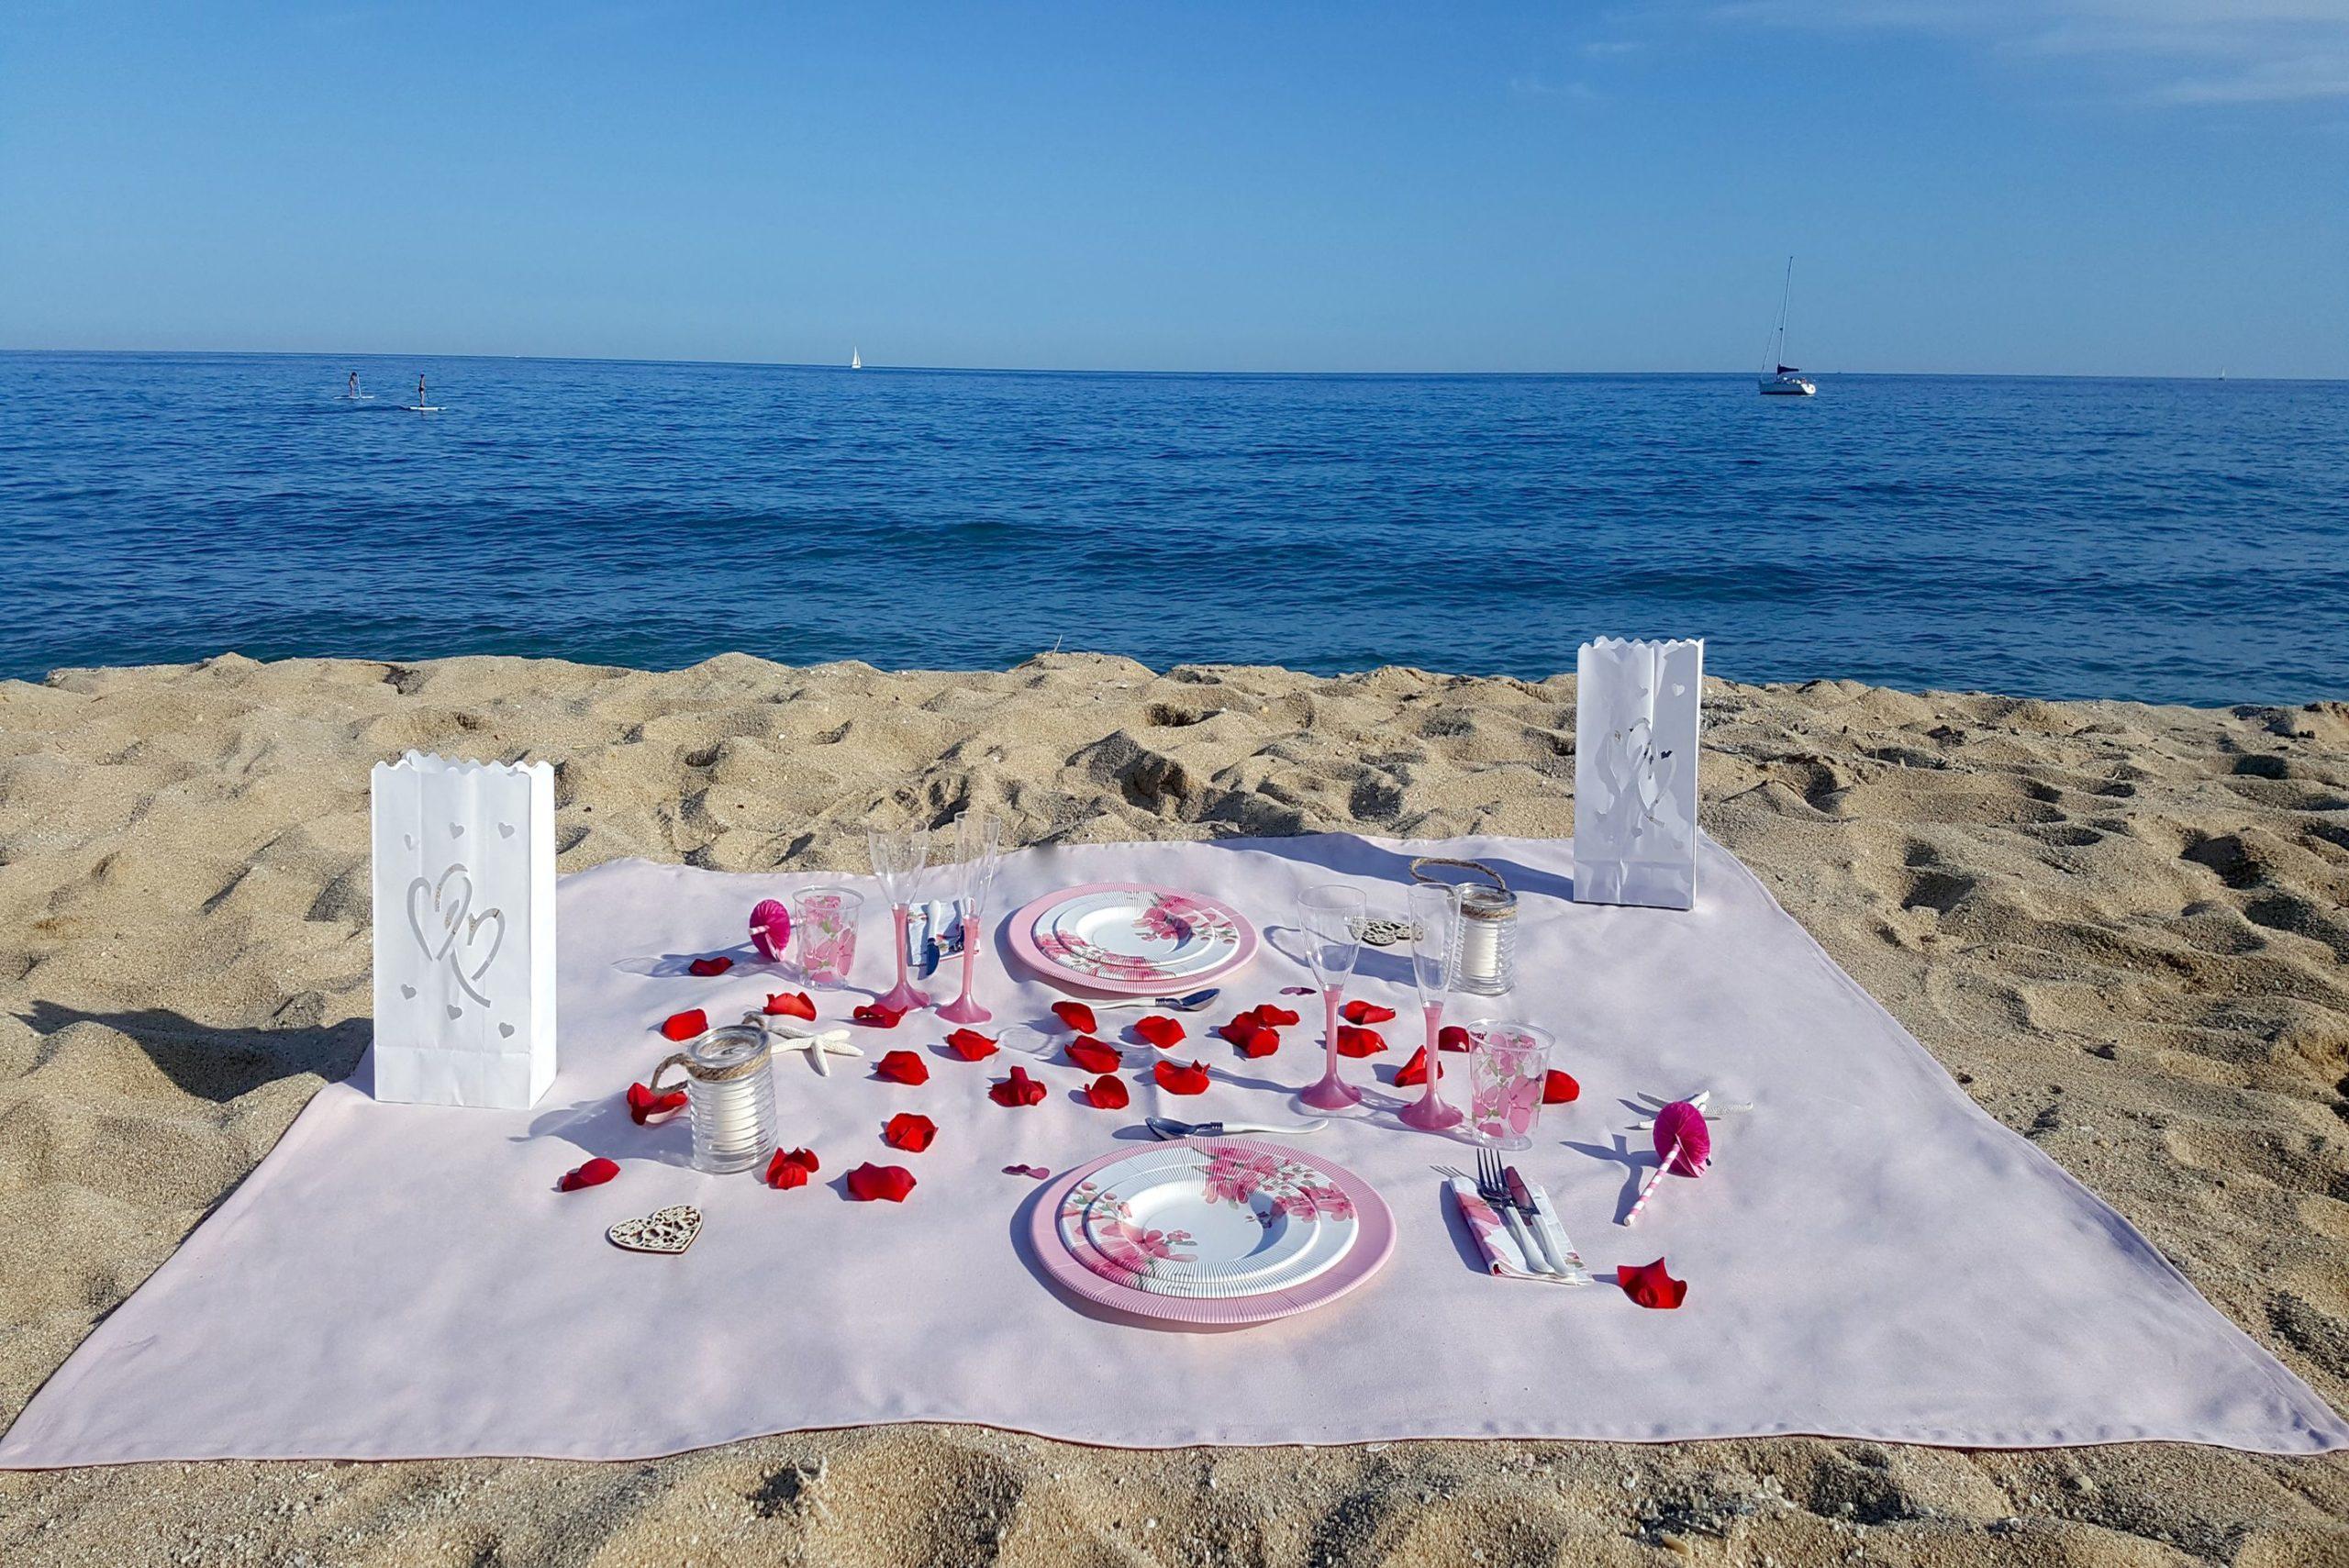 Picnic Romántico Playa -Cierzo Outdoor Pack - Loverspack